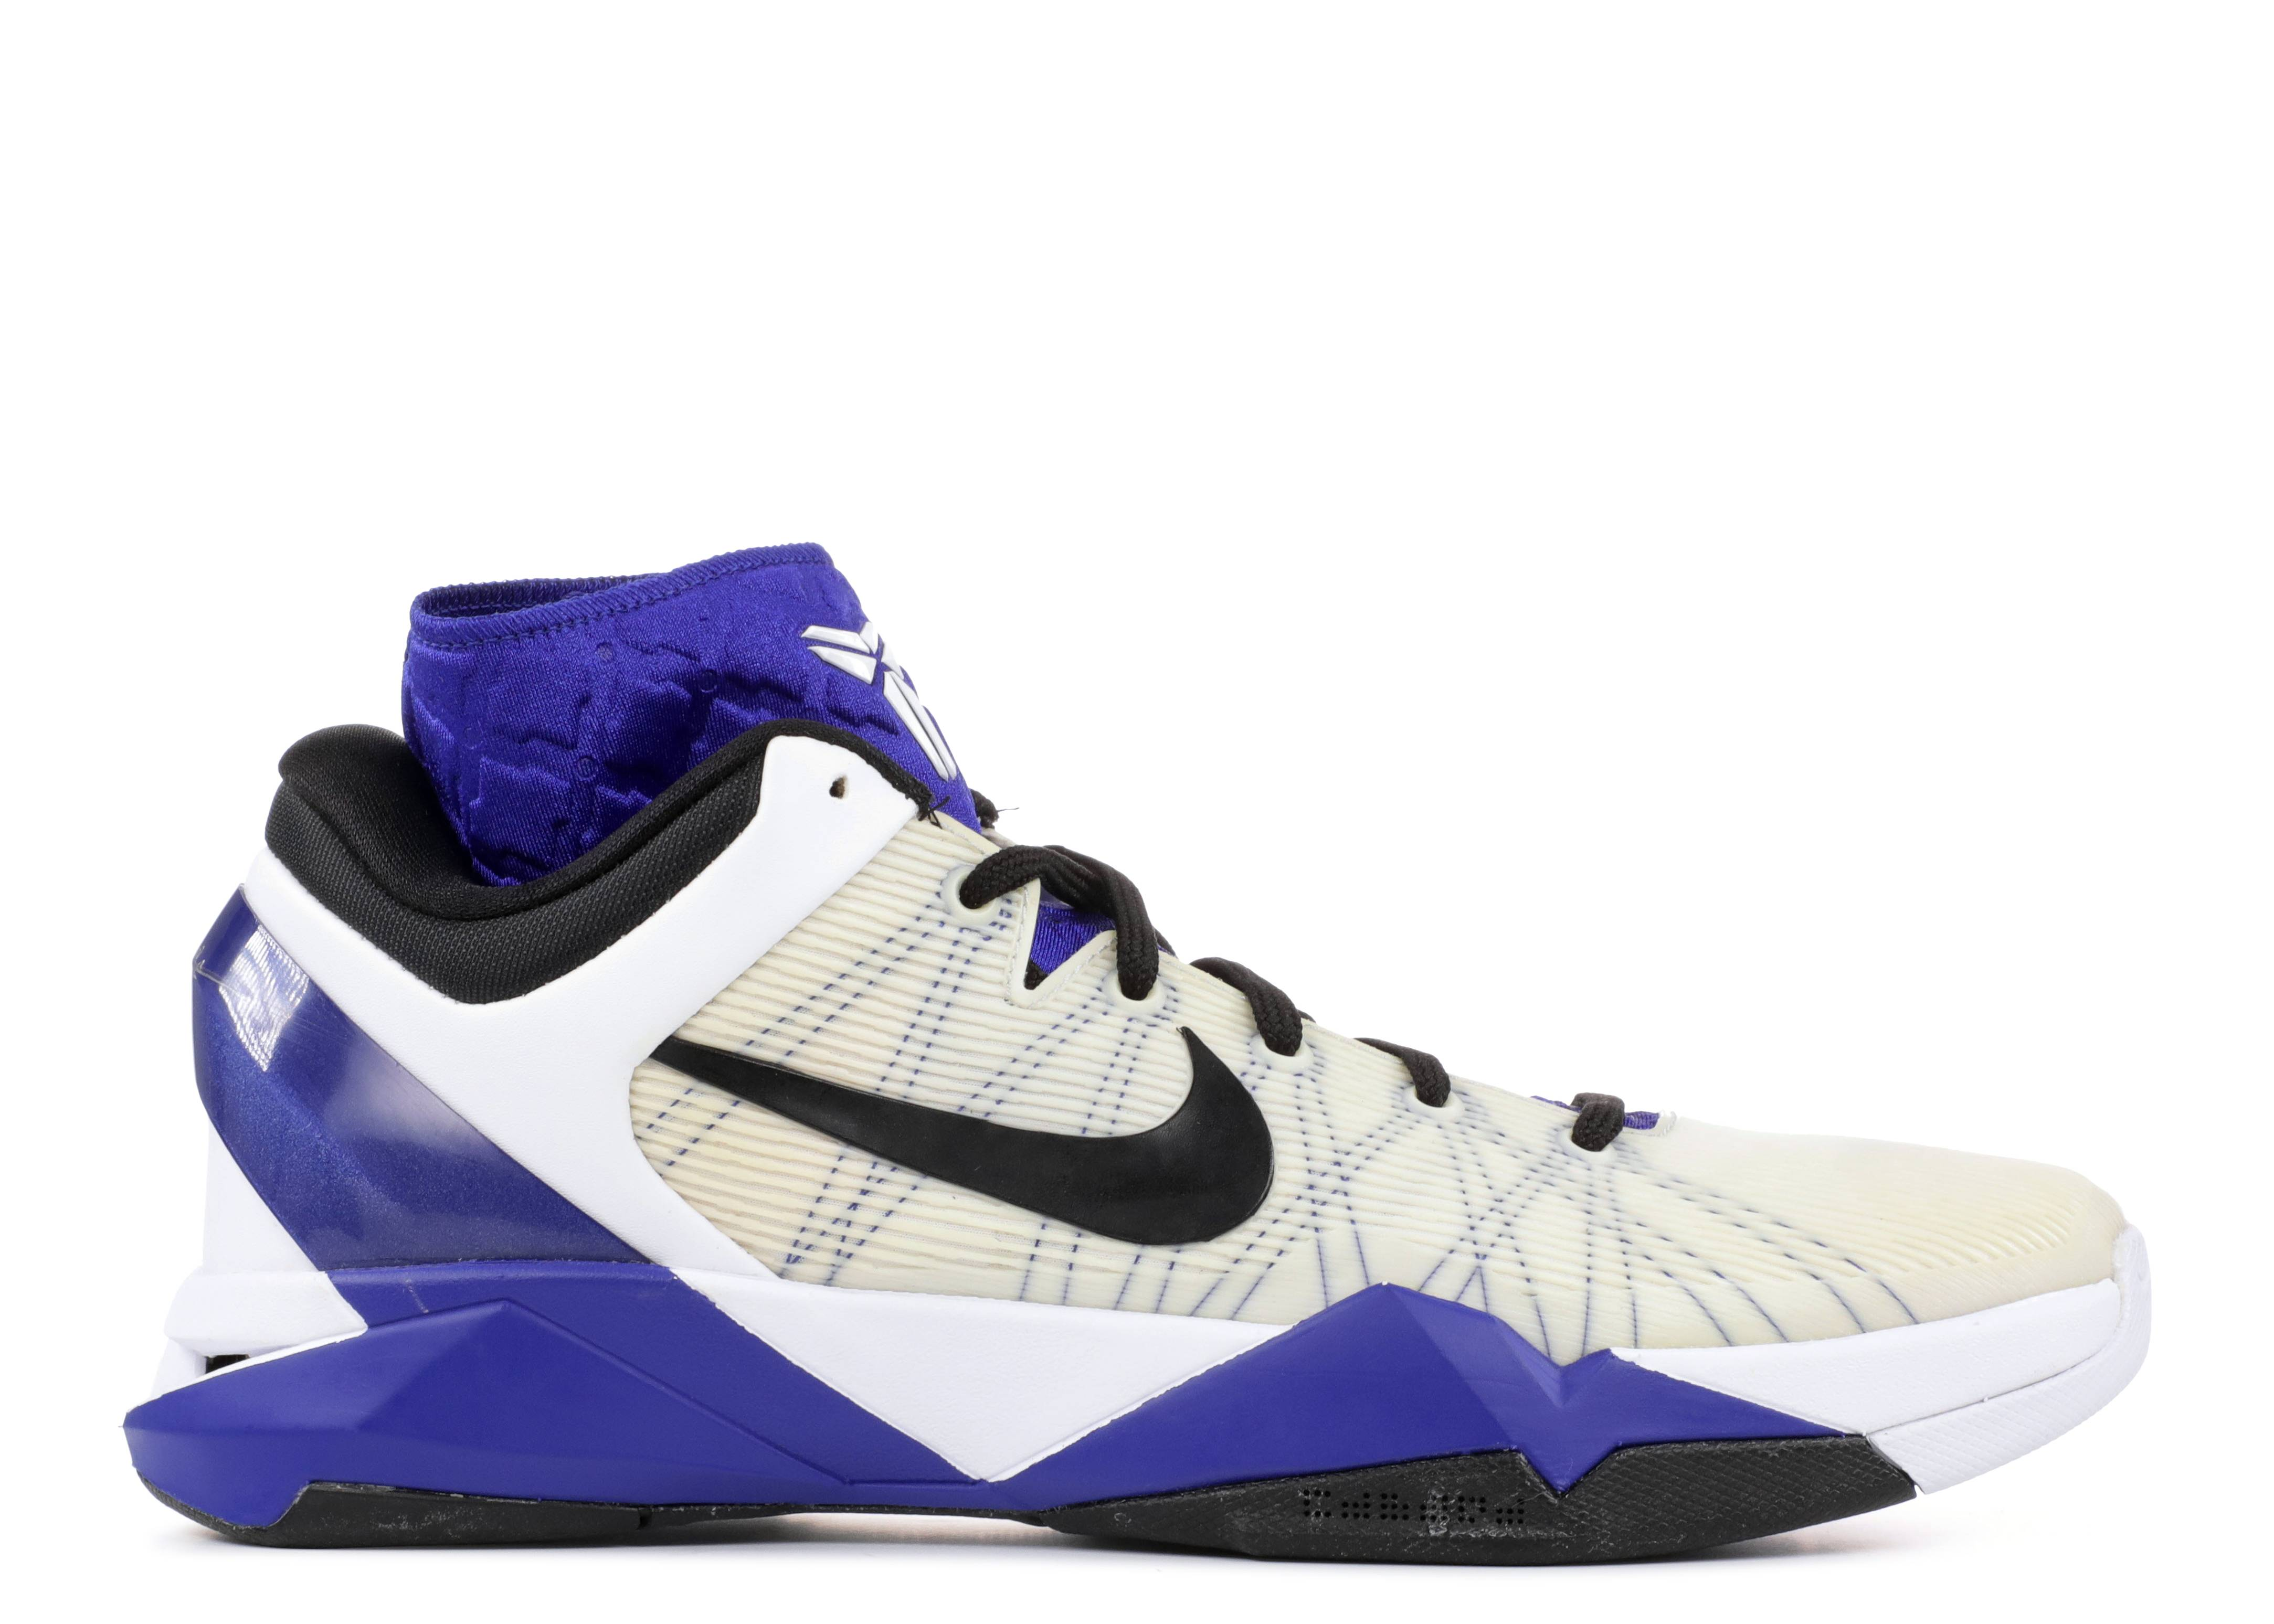 sale retailer 2464a 8ec9b ... Nike Kobe VII System Supreme White Black Concord 488244-100 (4)  Zoom  Kobe 7 Supreme ...